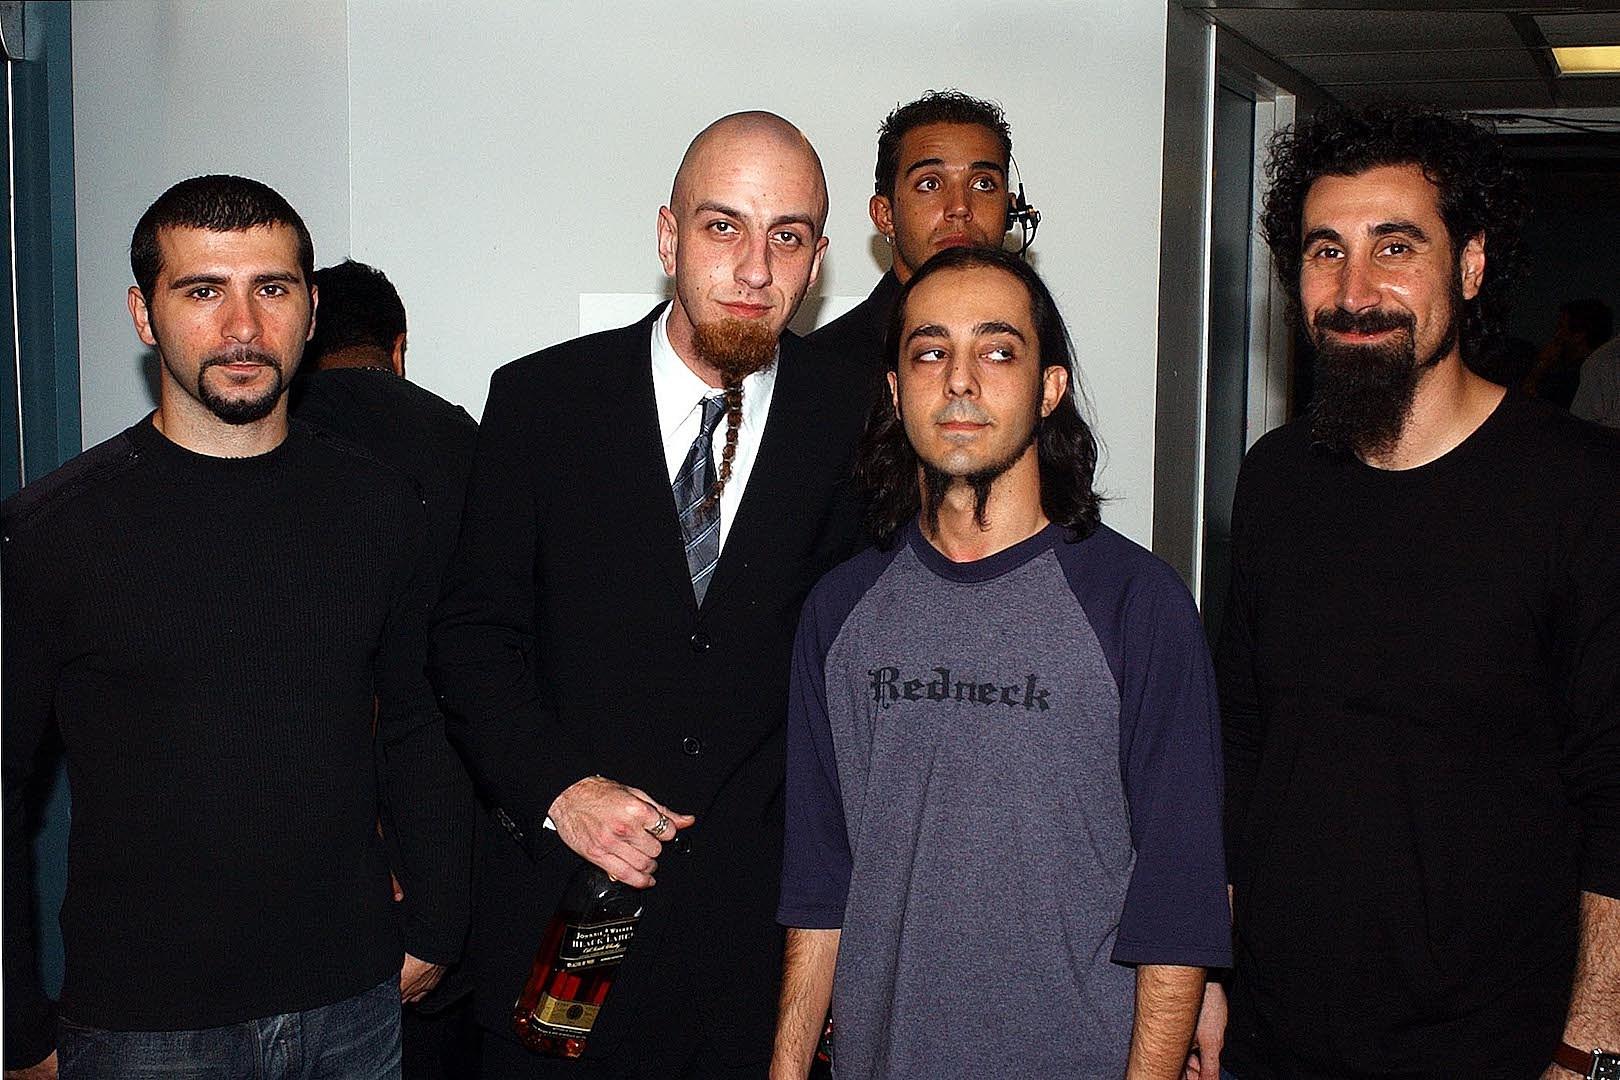 Daron Malakian Recalls Releasing SOAD's 'Toxicity' Before 9/11